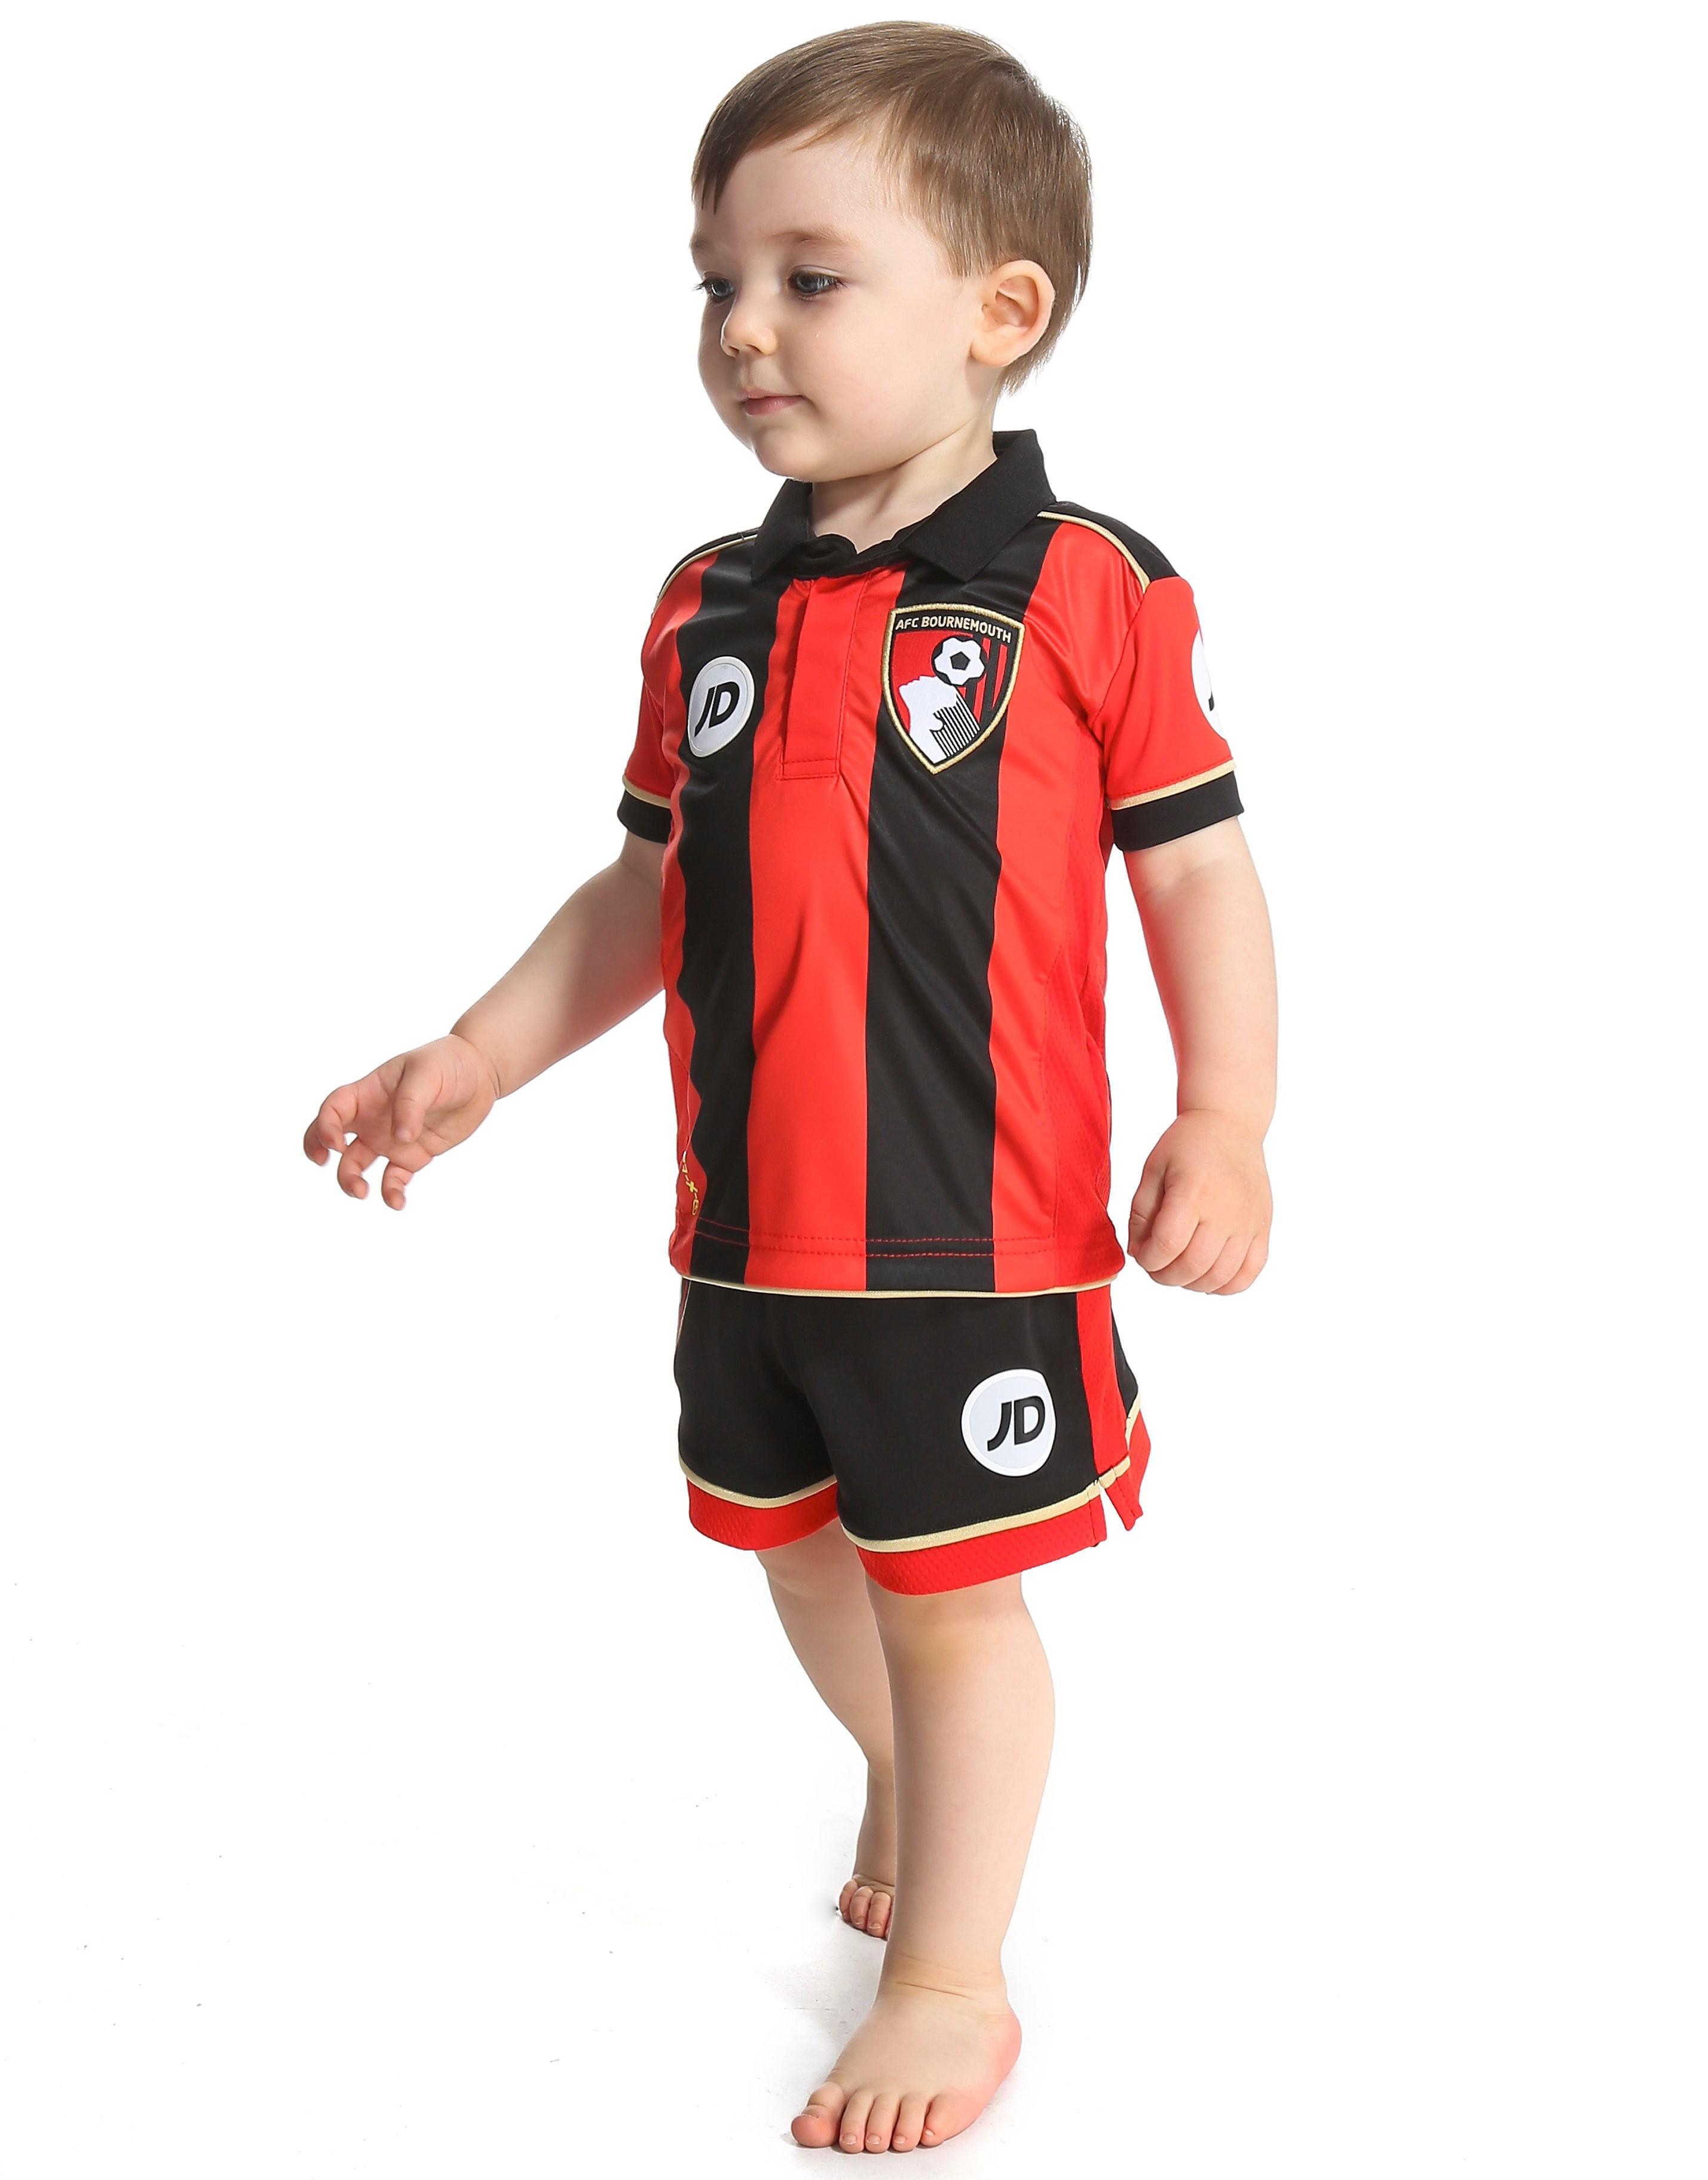 JD AFC Bournemouth 2016/17 Home Kit Infant